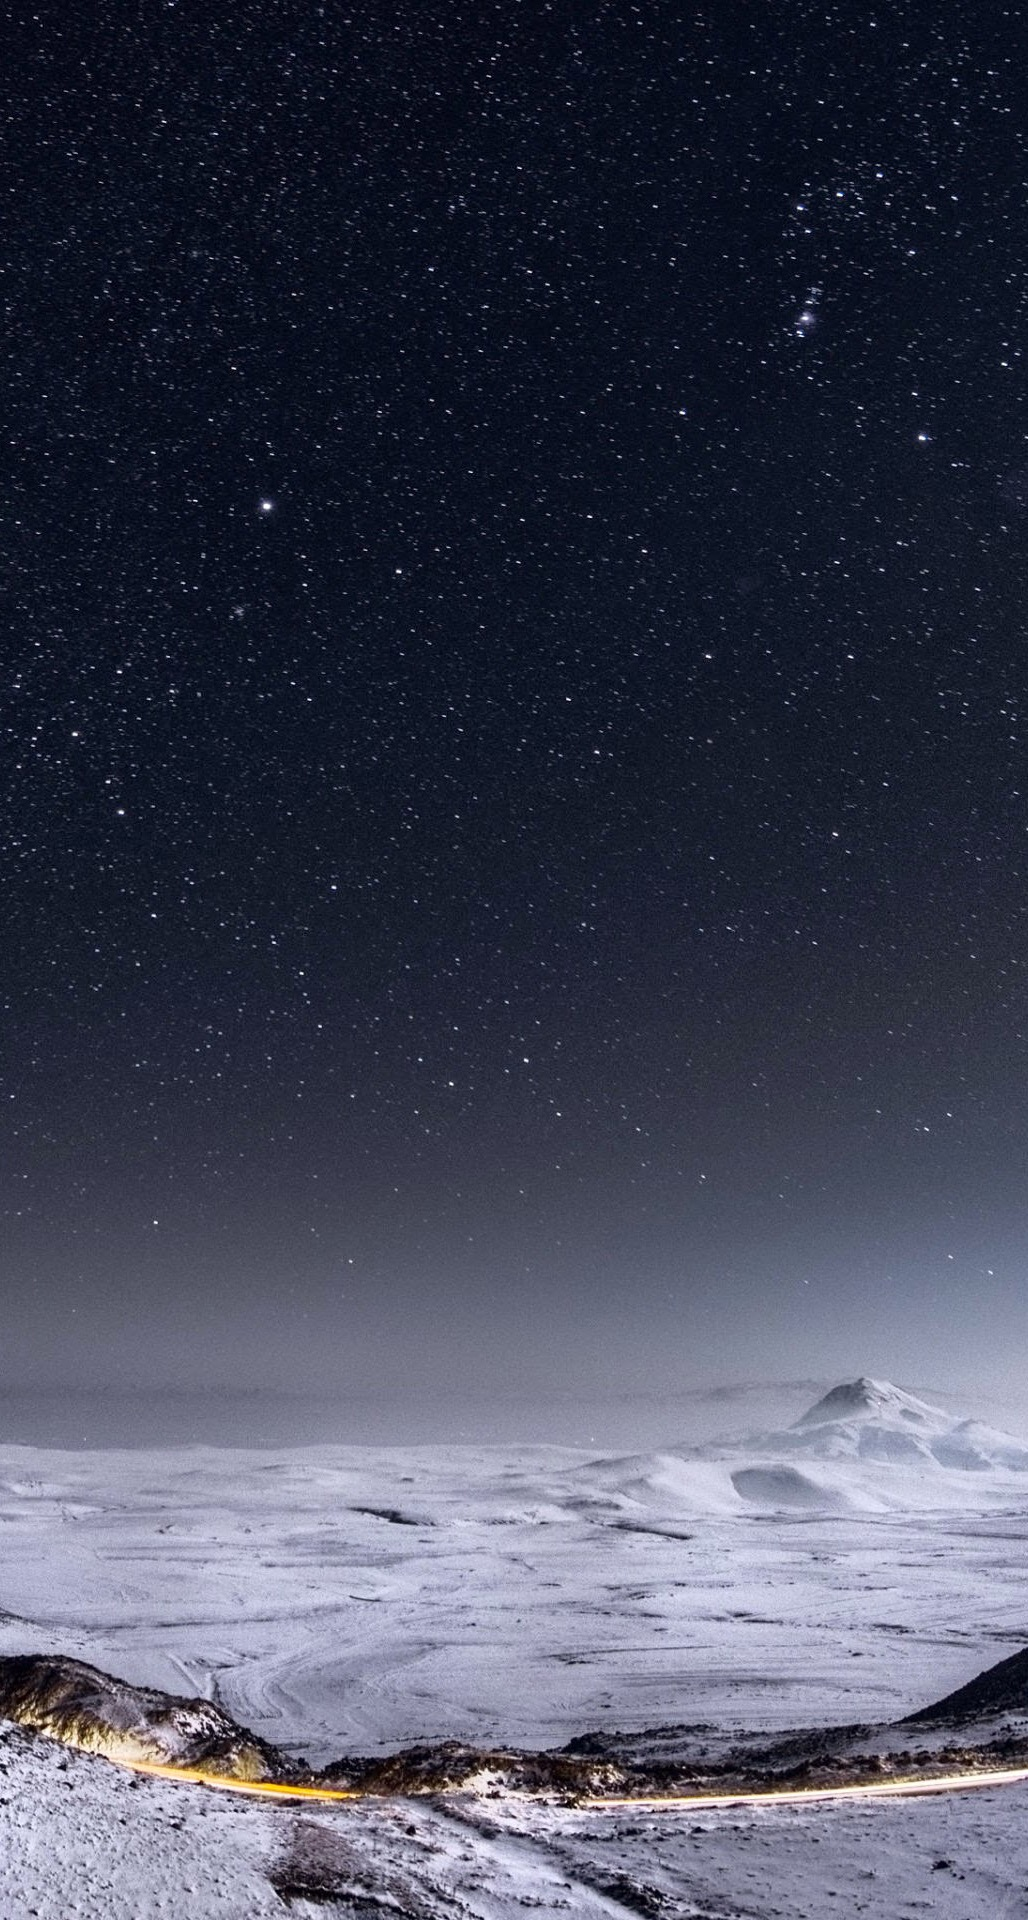 Wallpaper iphone winter - Winter Landscape Iphone 6 Plus Hd Wallpaper Ipod Wallpaper Hd Free